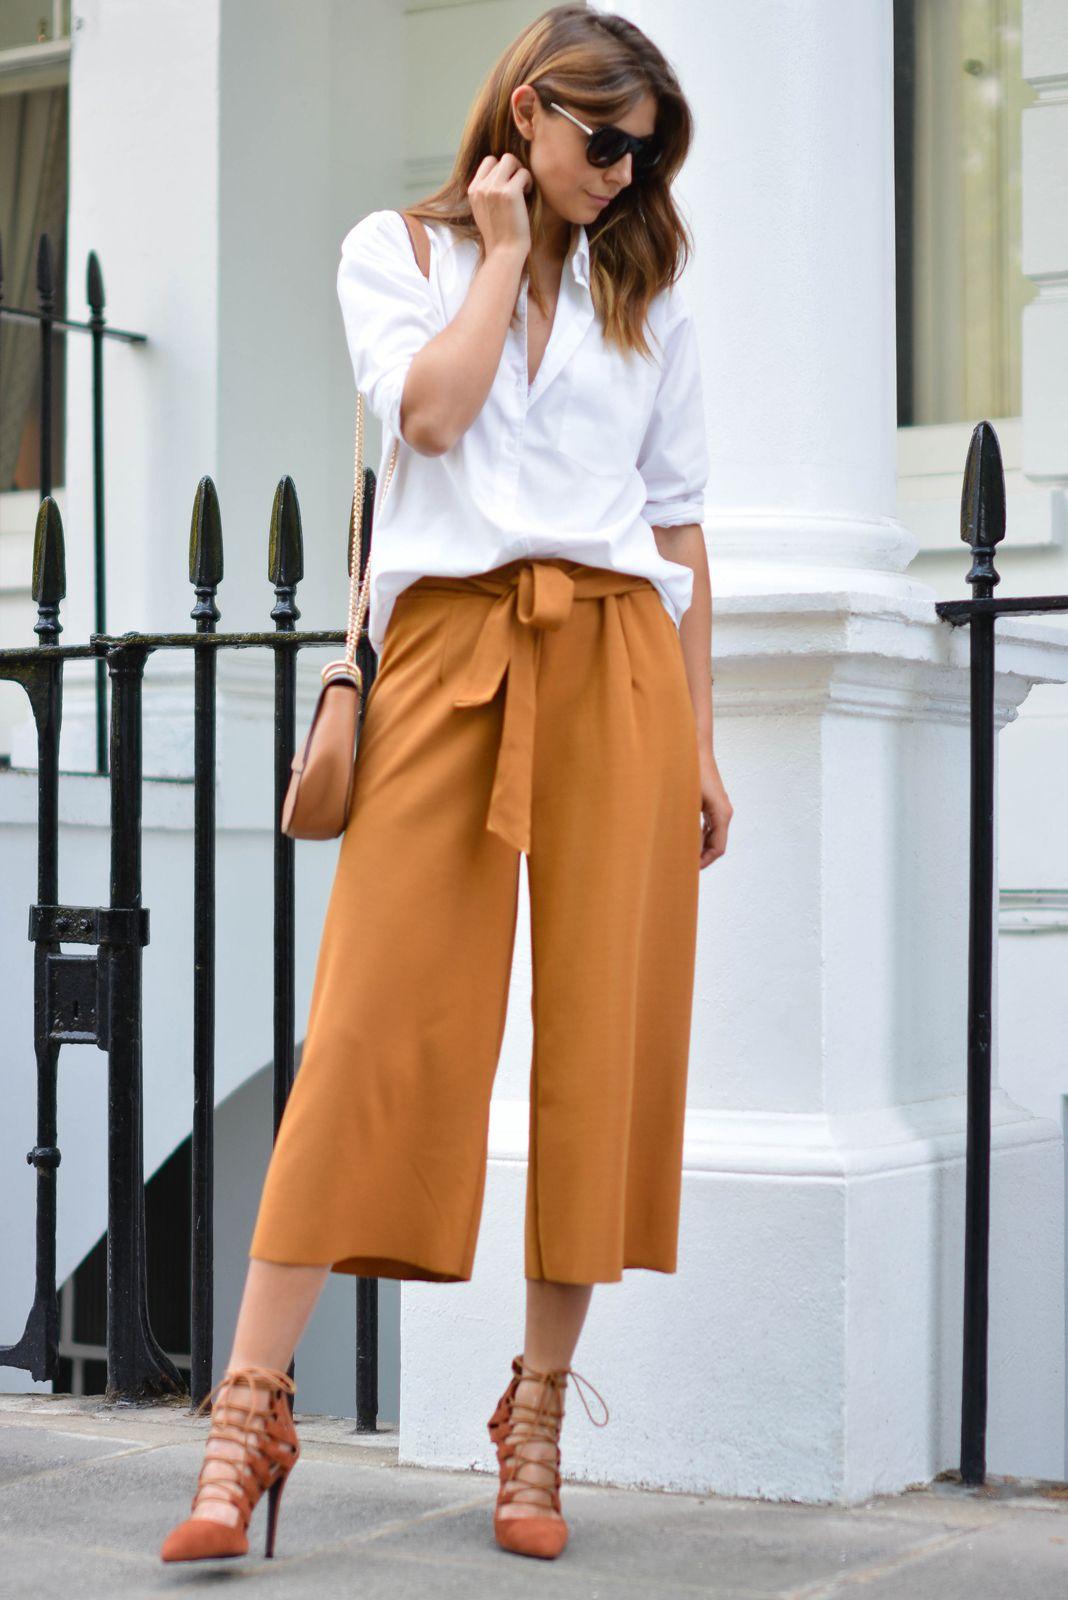 Pin by chandra sakhrani on outfit inspirations pinterest white